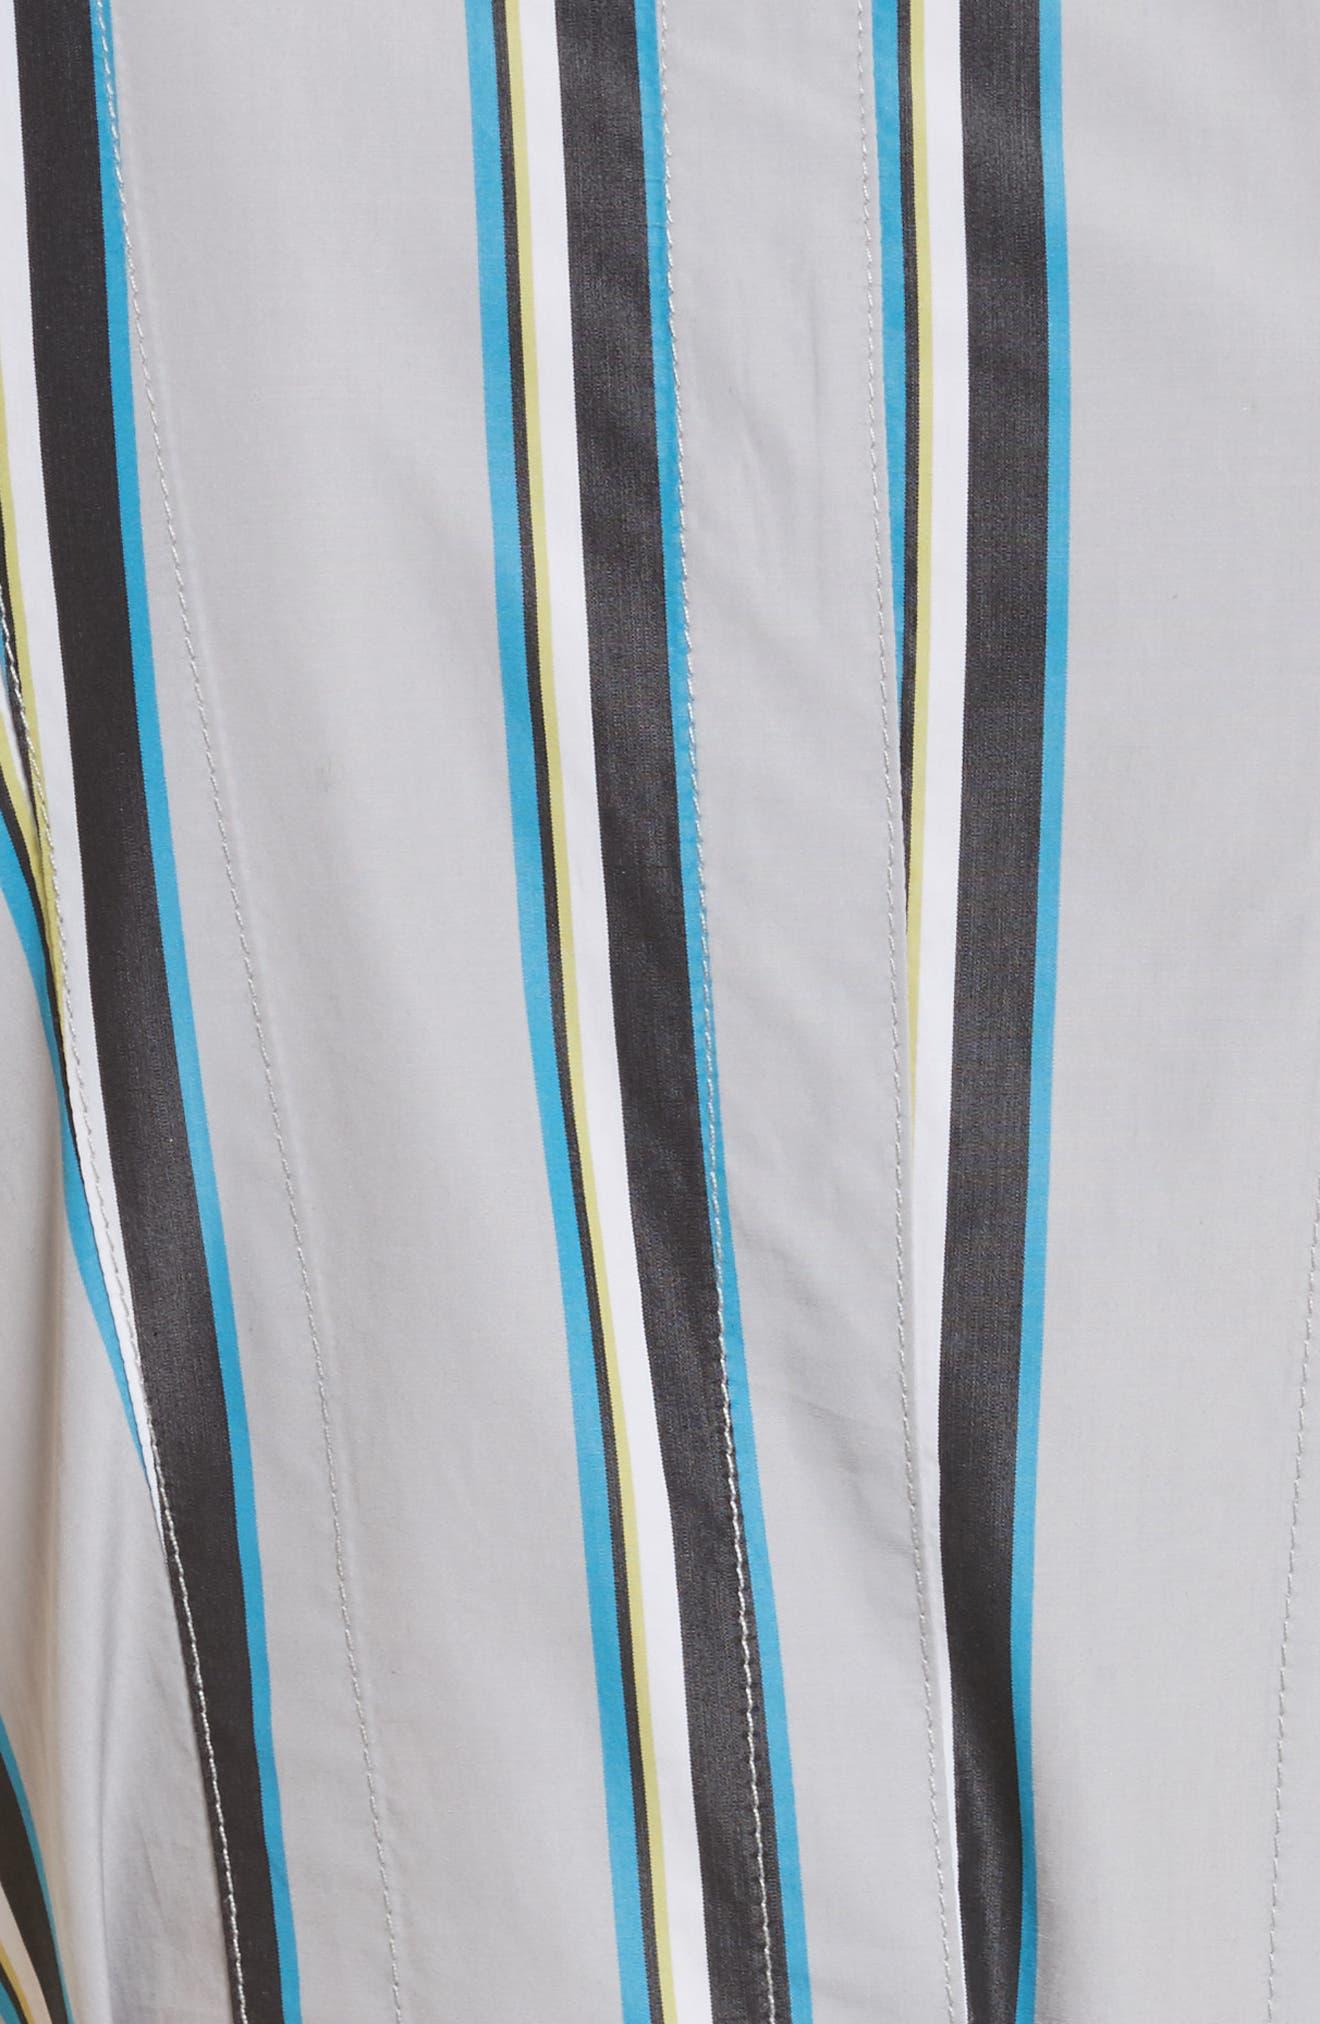 Diane von Furstenberg Stripe Belted Maxi Dress,                             Alternate thumbnail 5, color,                             Smoke Multi